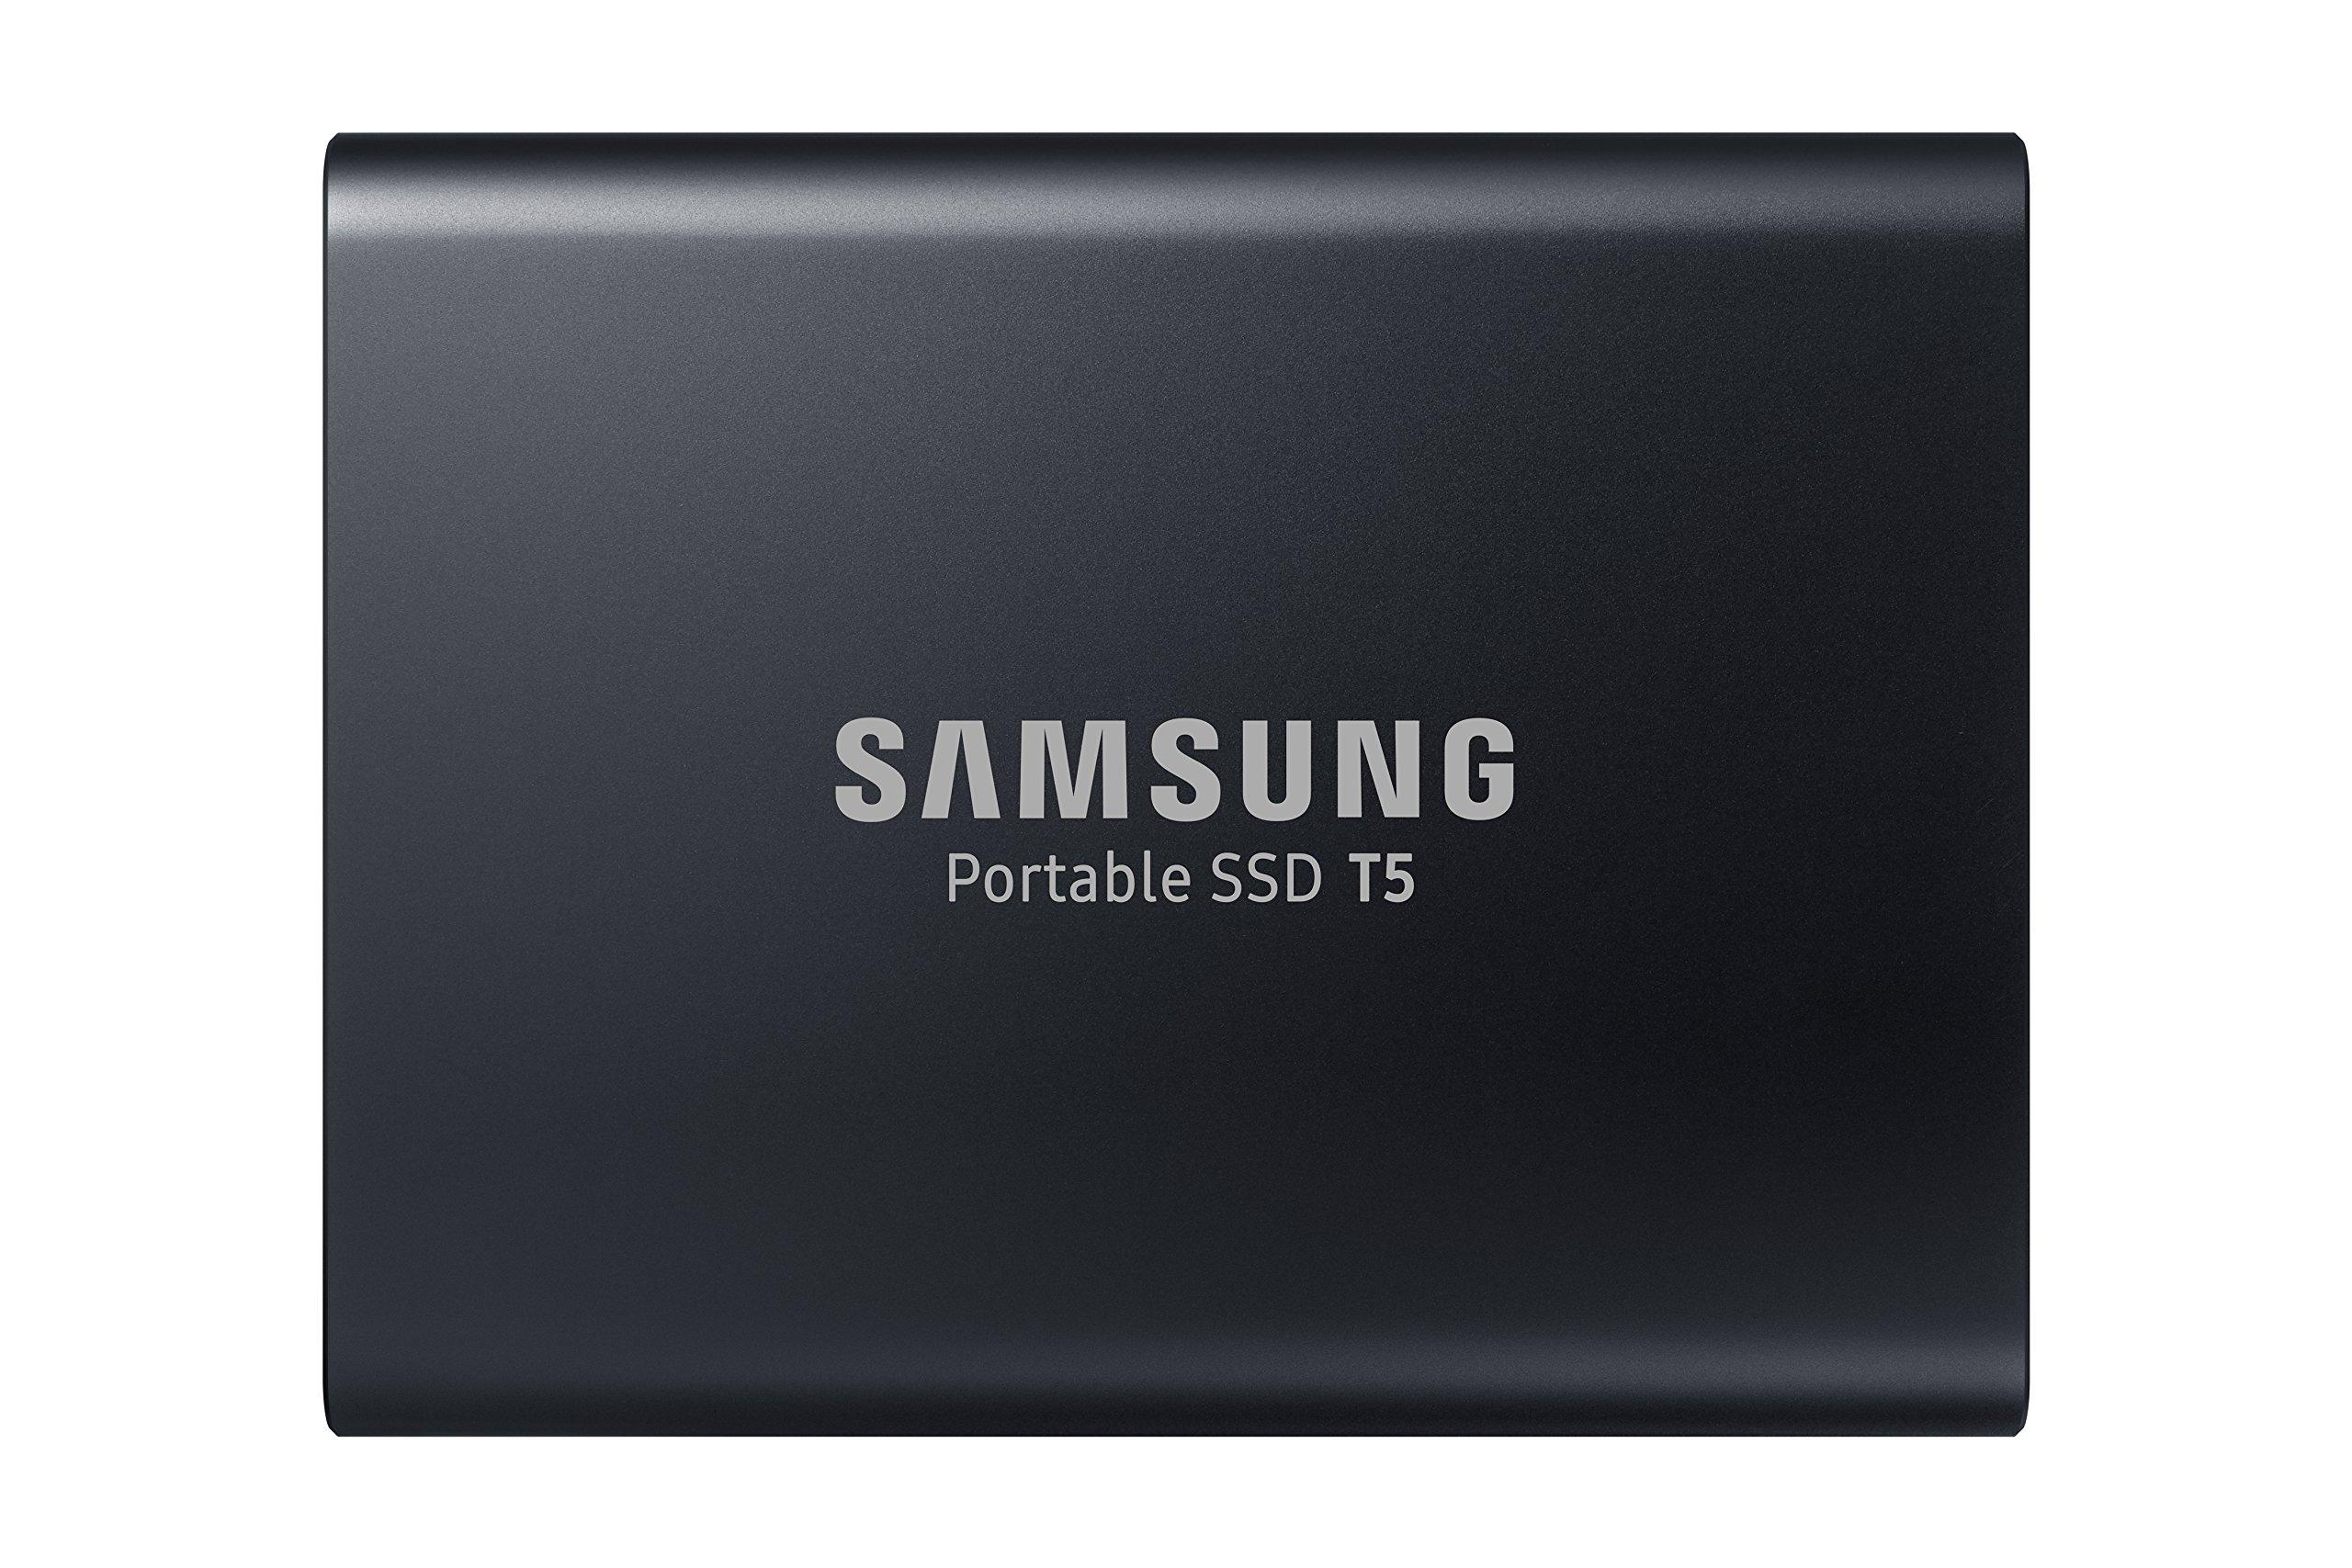 Samsung T5 Portable SSD - 1TB - USB 3.1 External SSD (MU-PA1T0B/AM) by Samsung